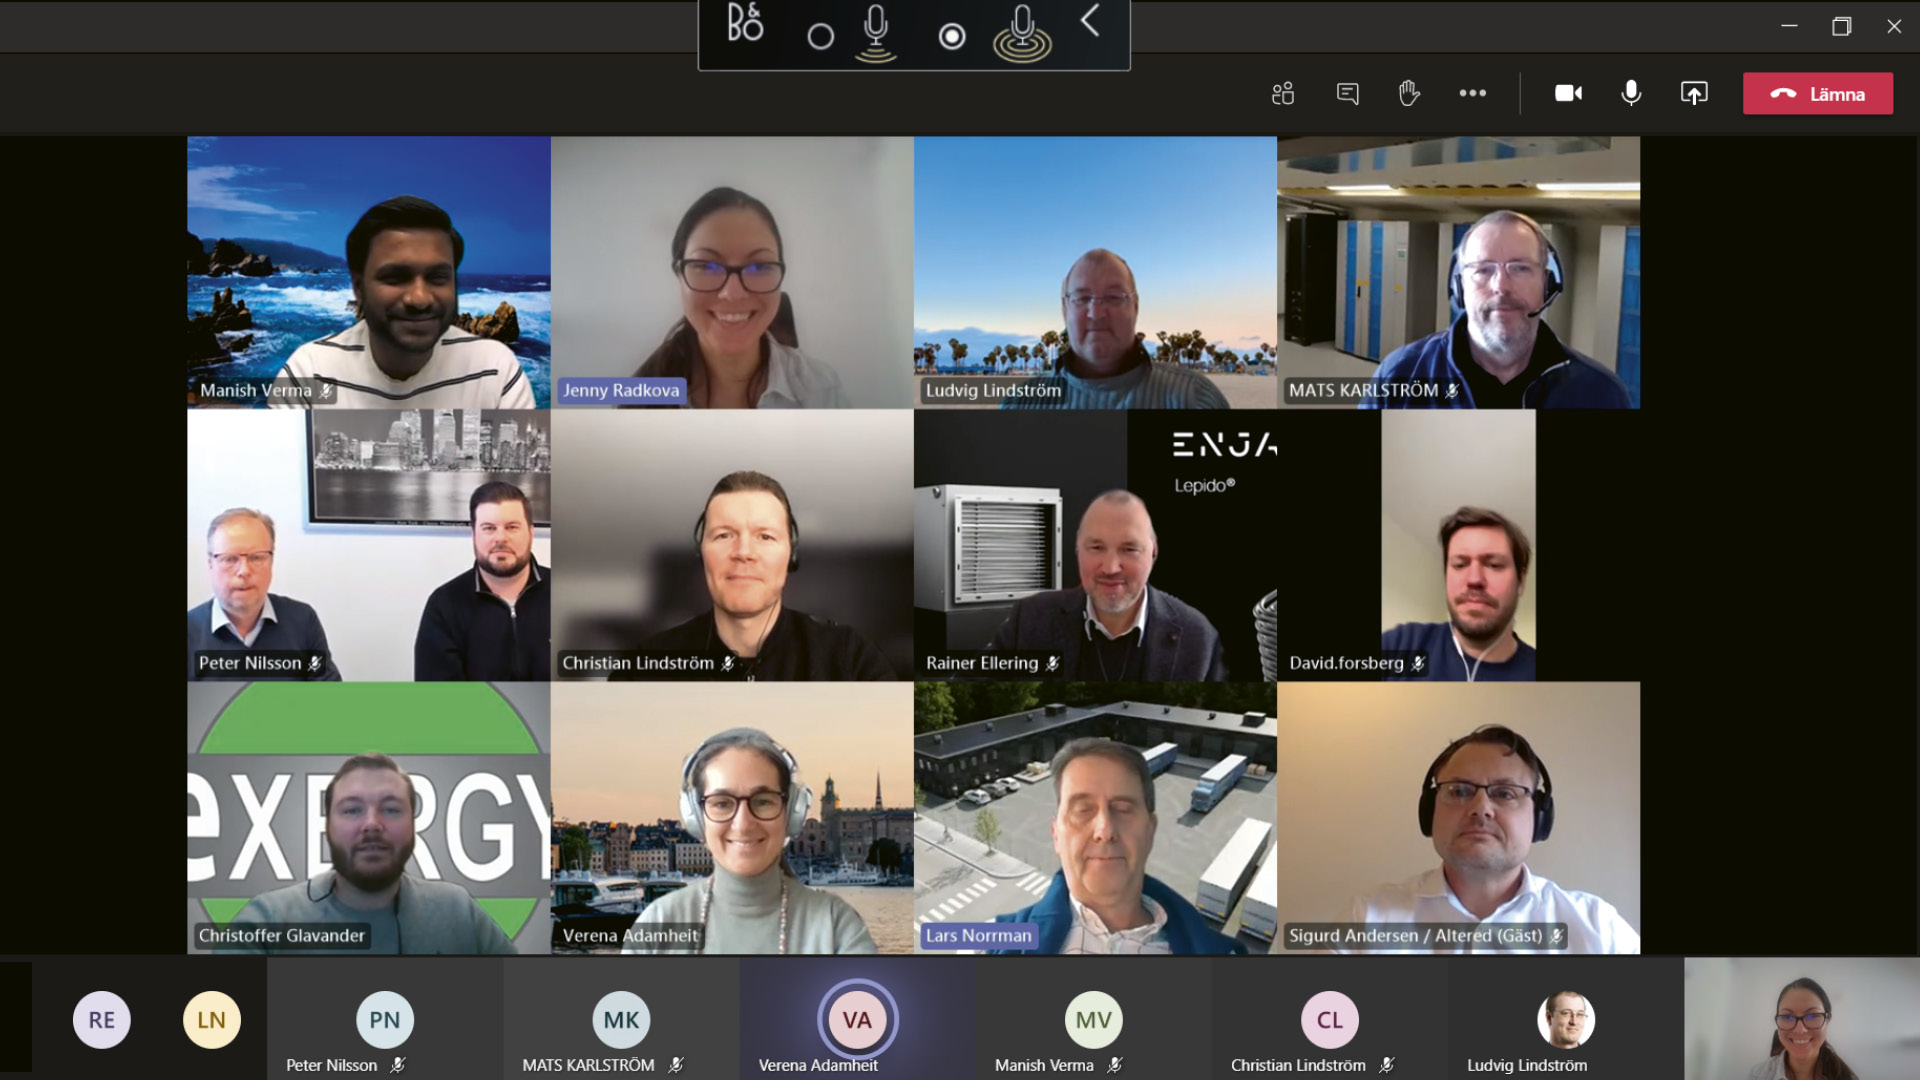 Screen image of fourteen people in a digital meeting.